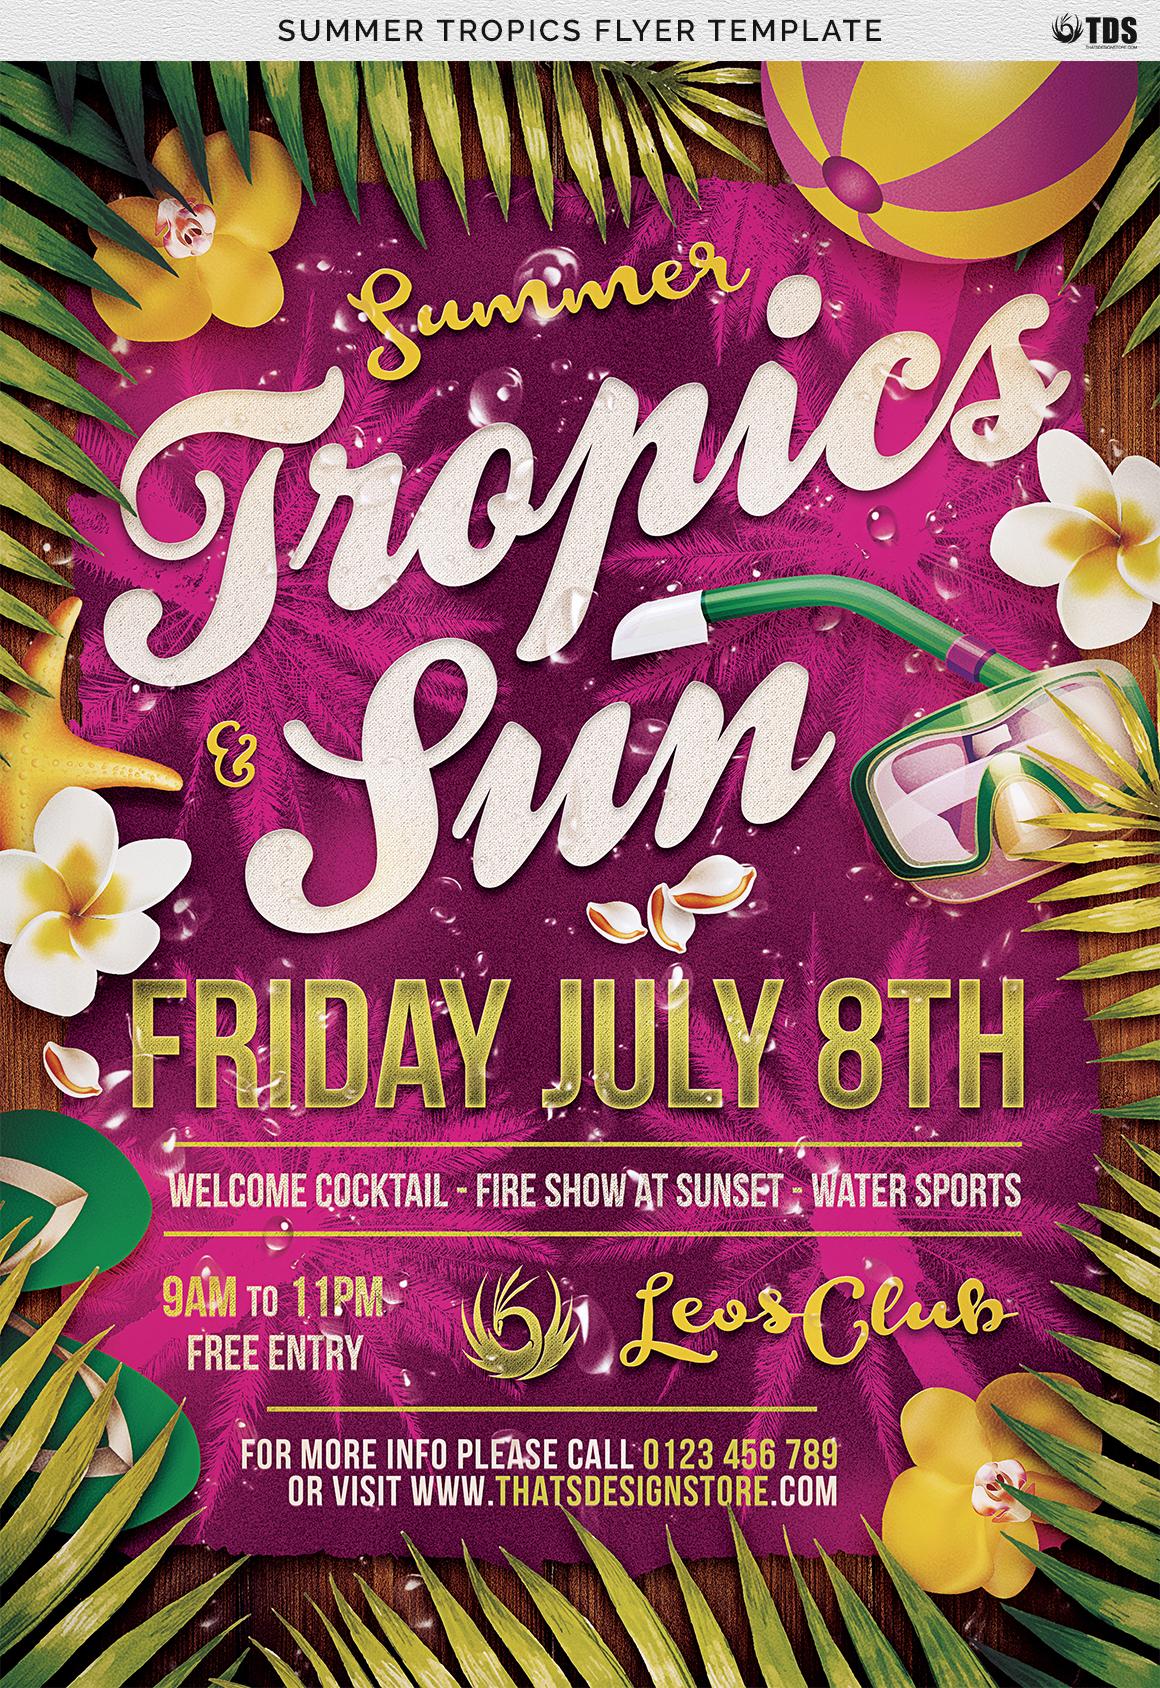 Summer Tropics Flyer Template example image 4